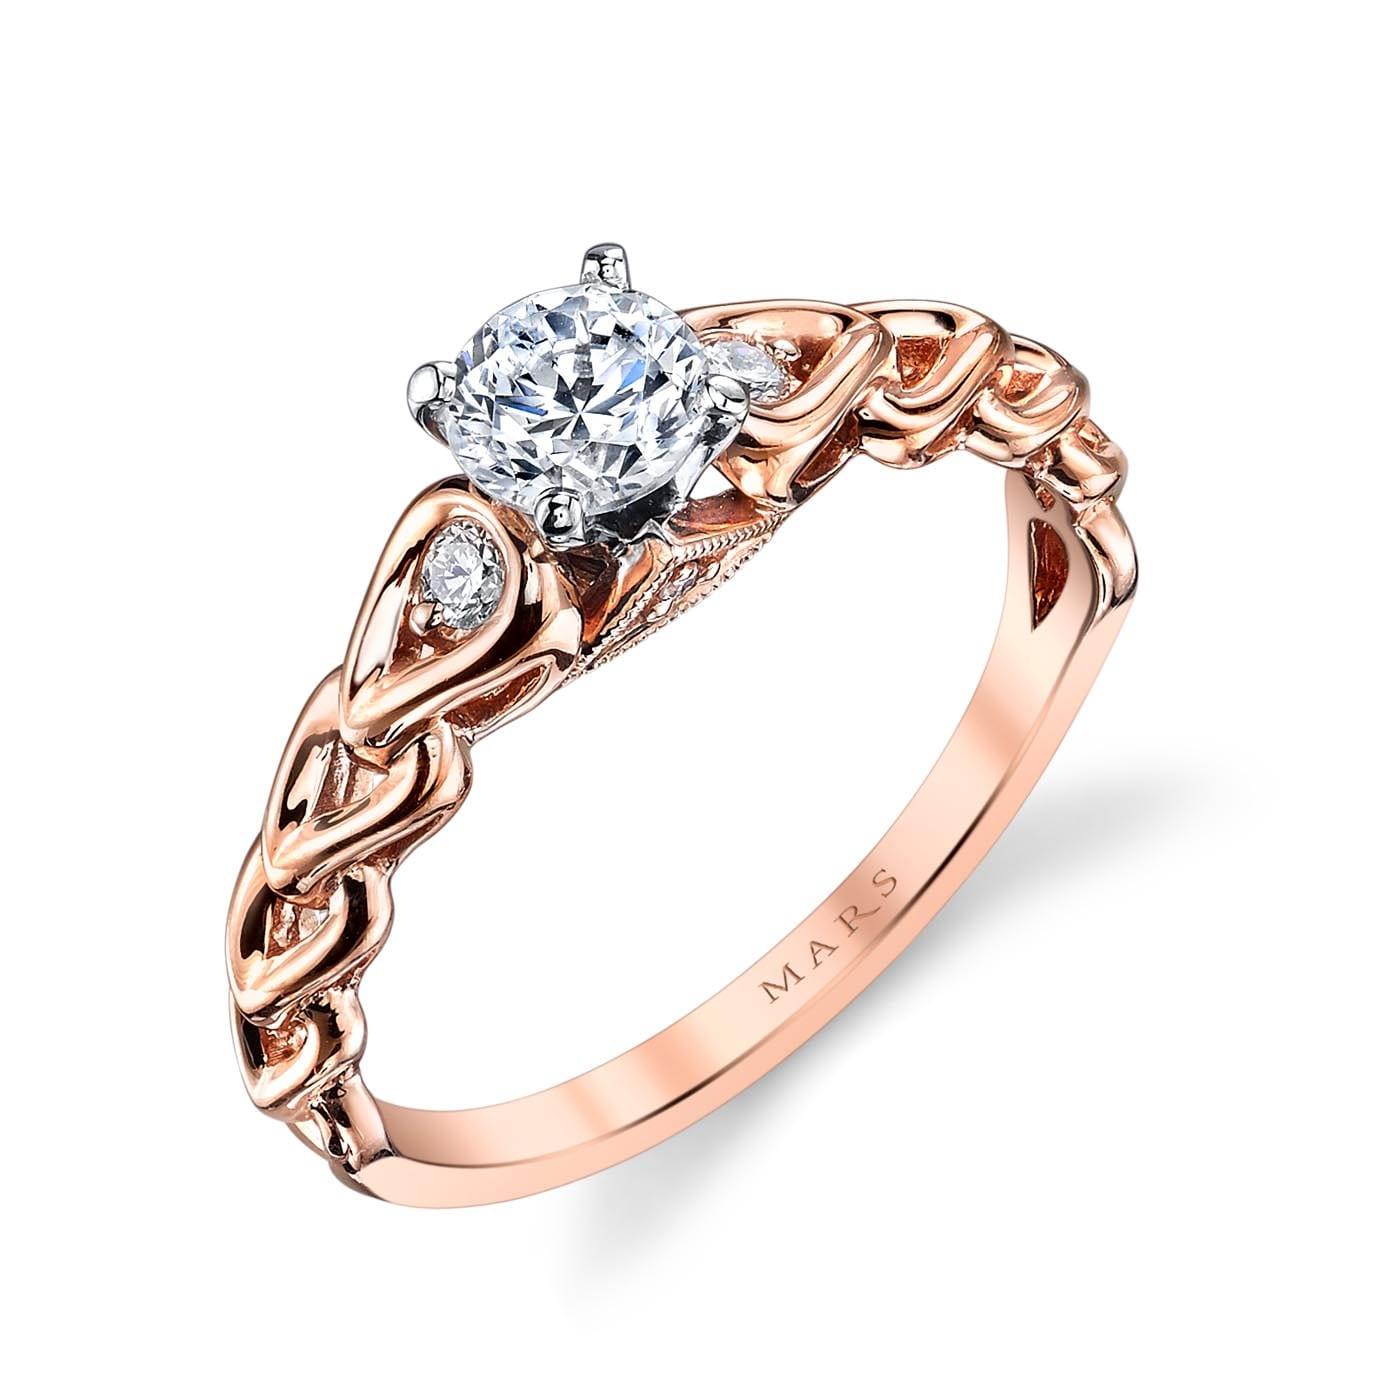 Three_Stone Engagement RingStyle #: MARS 25803